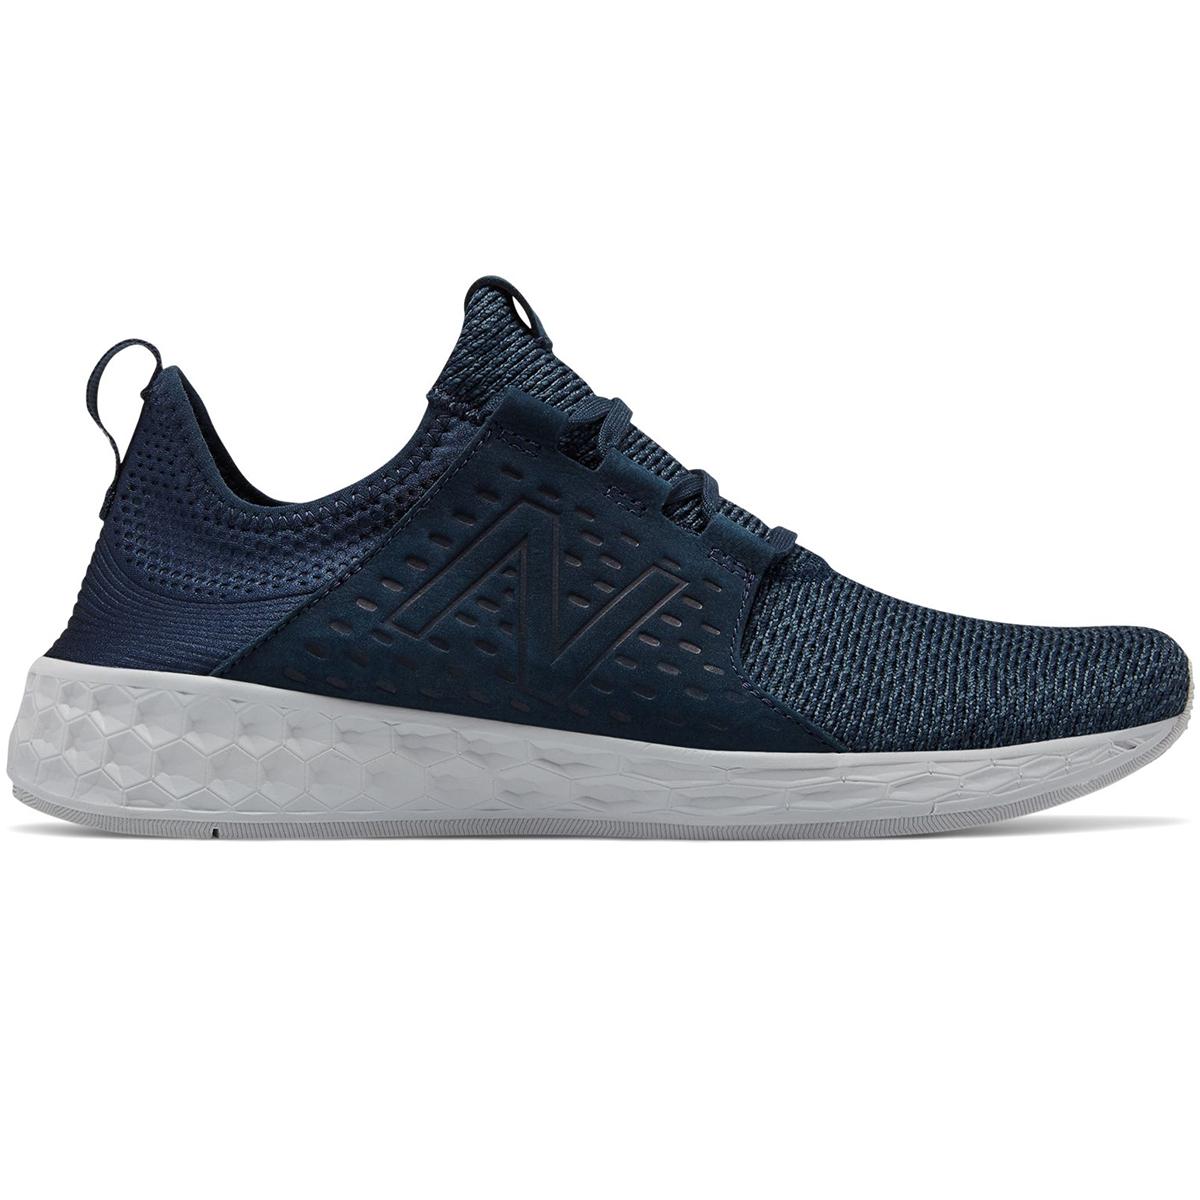 New Balance Men's Fresh Foam Cruz Retro Hoodie Running Shoes - Blue, 8